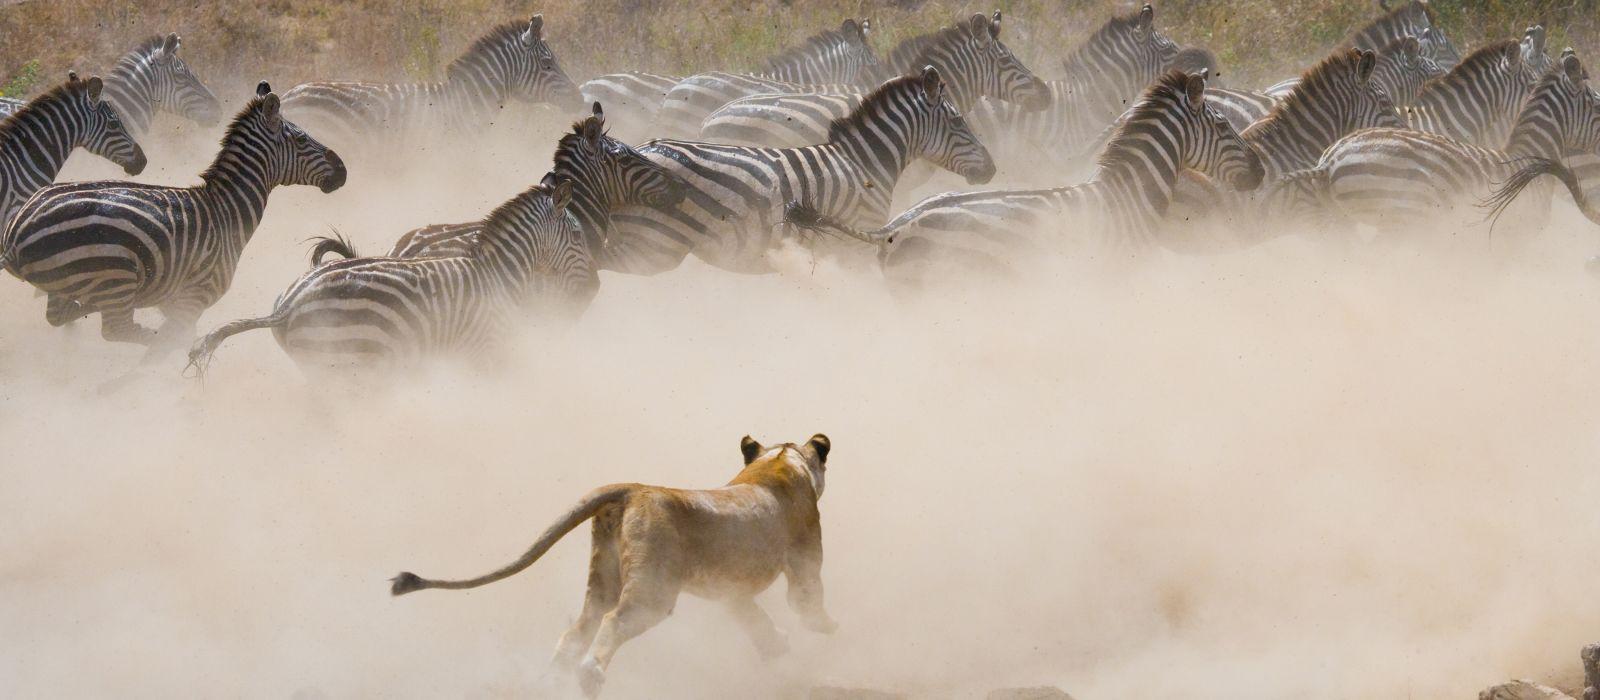 Löwin greift ein Zebra an, Nationalpark, Kenia